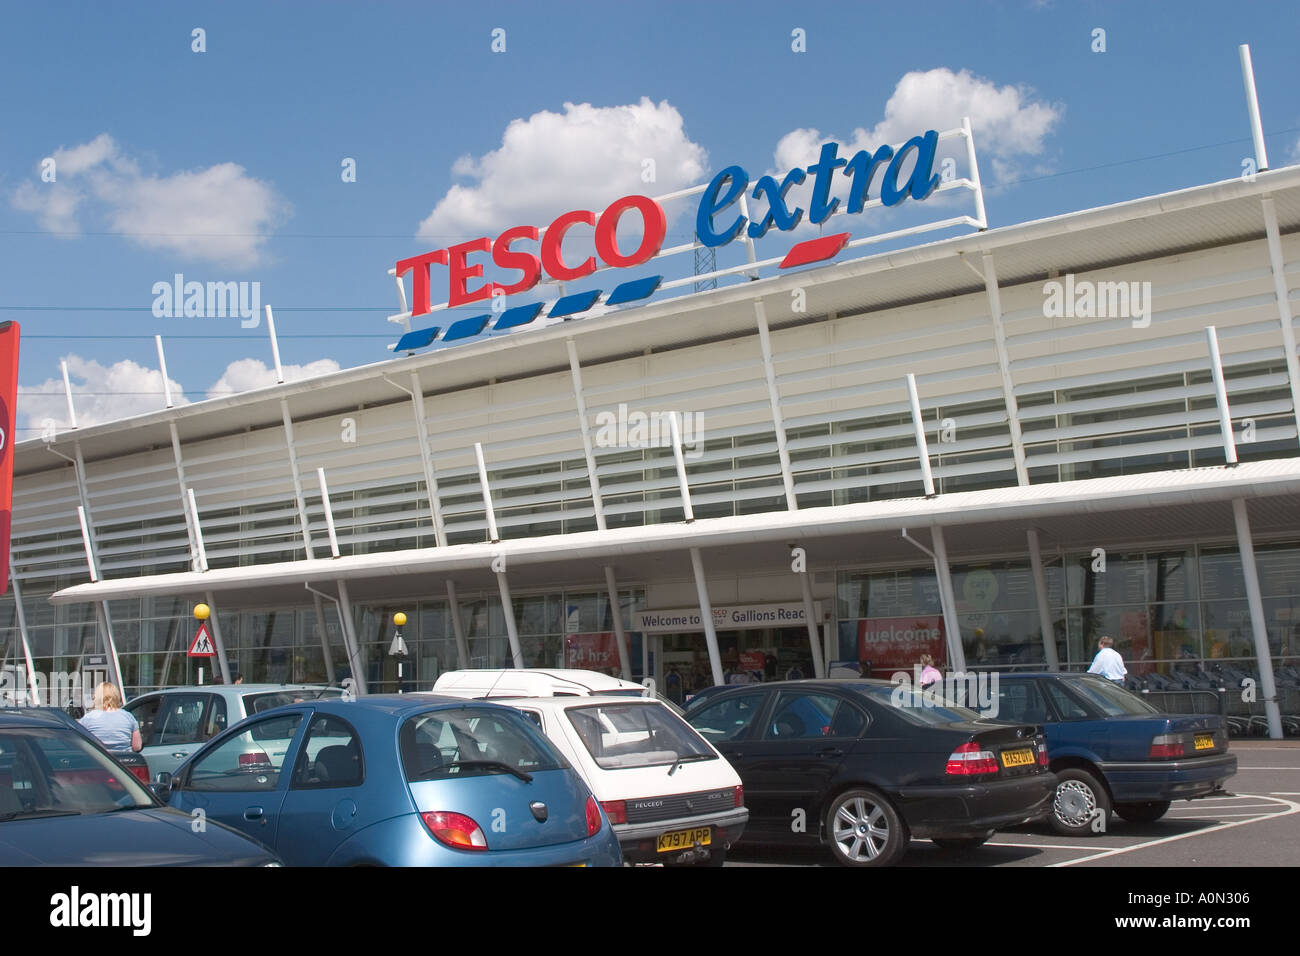 Tesco Extra at Gallions Reach Shopping Park Newham East london Stock Photo